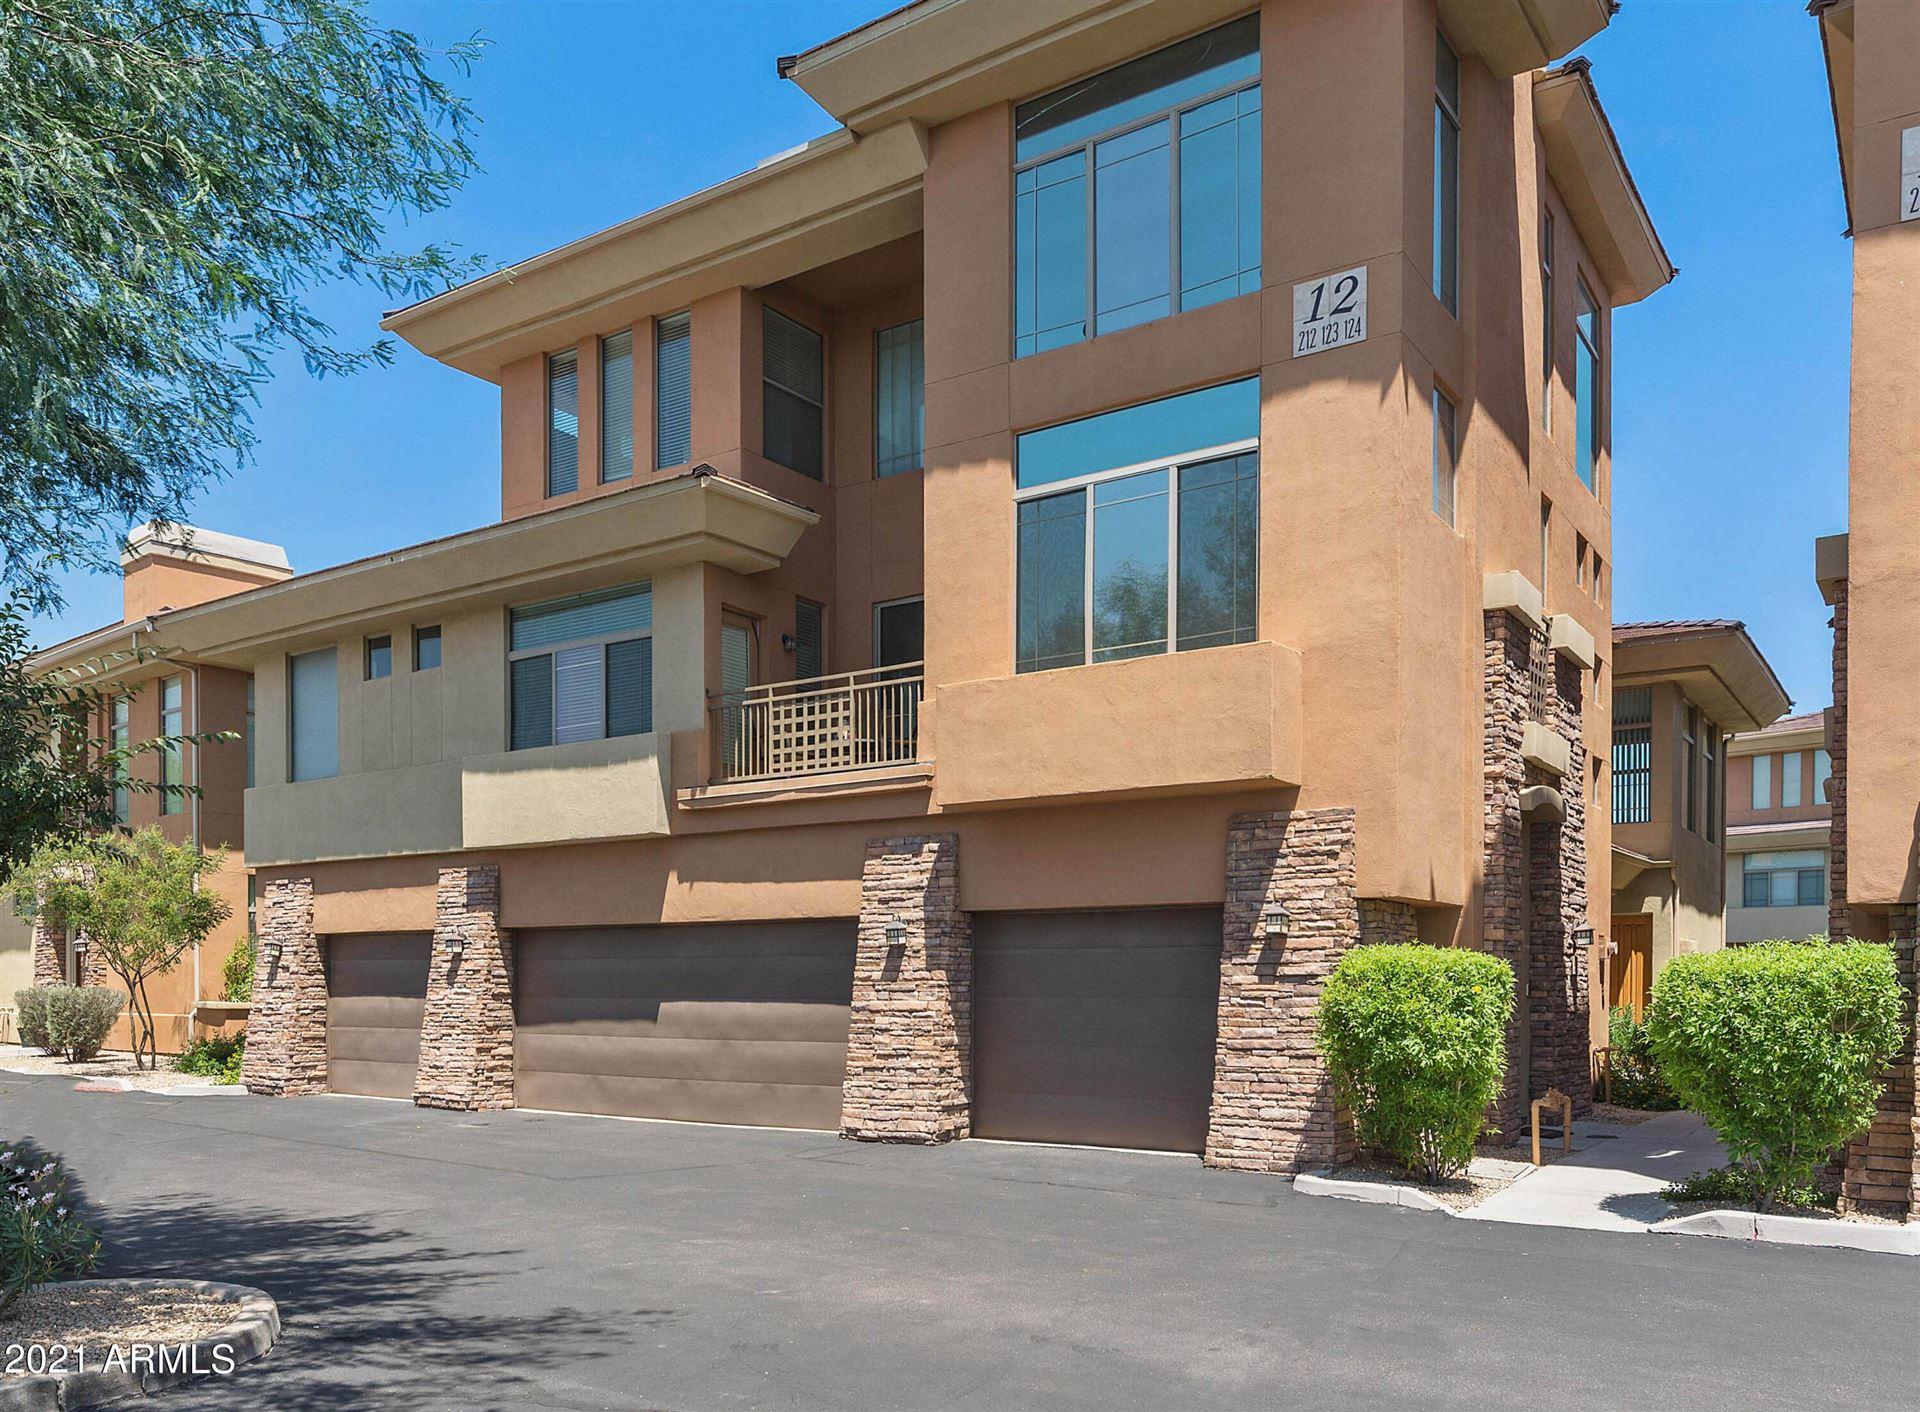 14450 N THOMPSON PEAK Parkway #212, Scottsdale, AZ 85260 - MLS#: 6271149